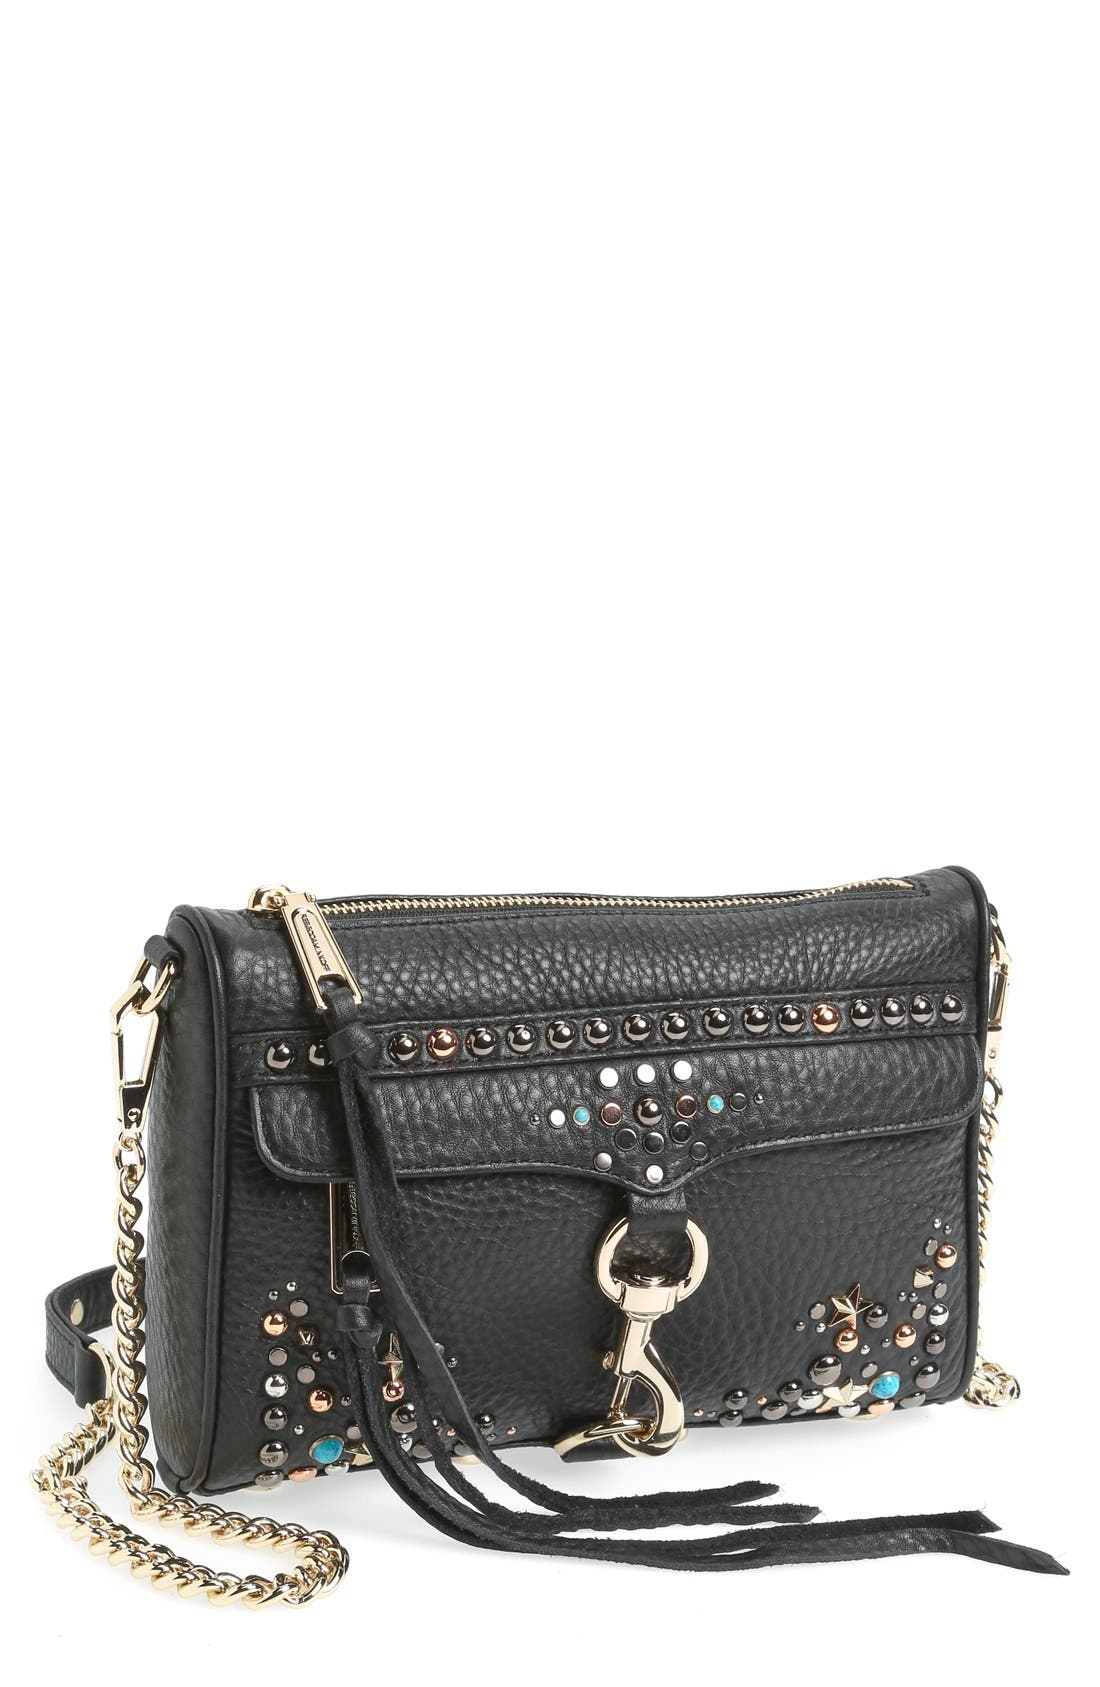 Main Image - Rebecca Minkoff 'Mini MAC - Austin' Studded Crossbody Bag